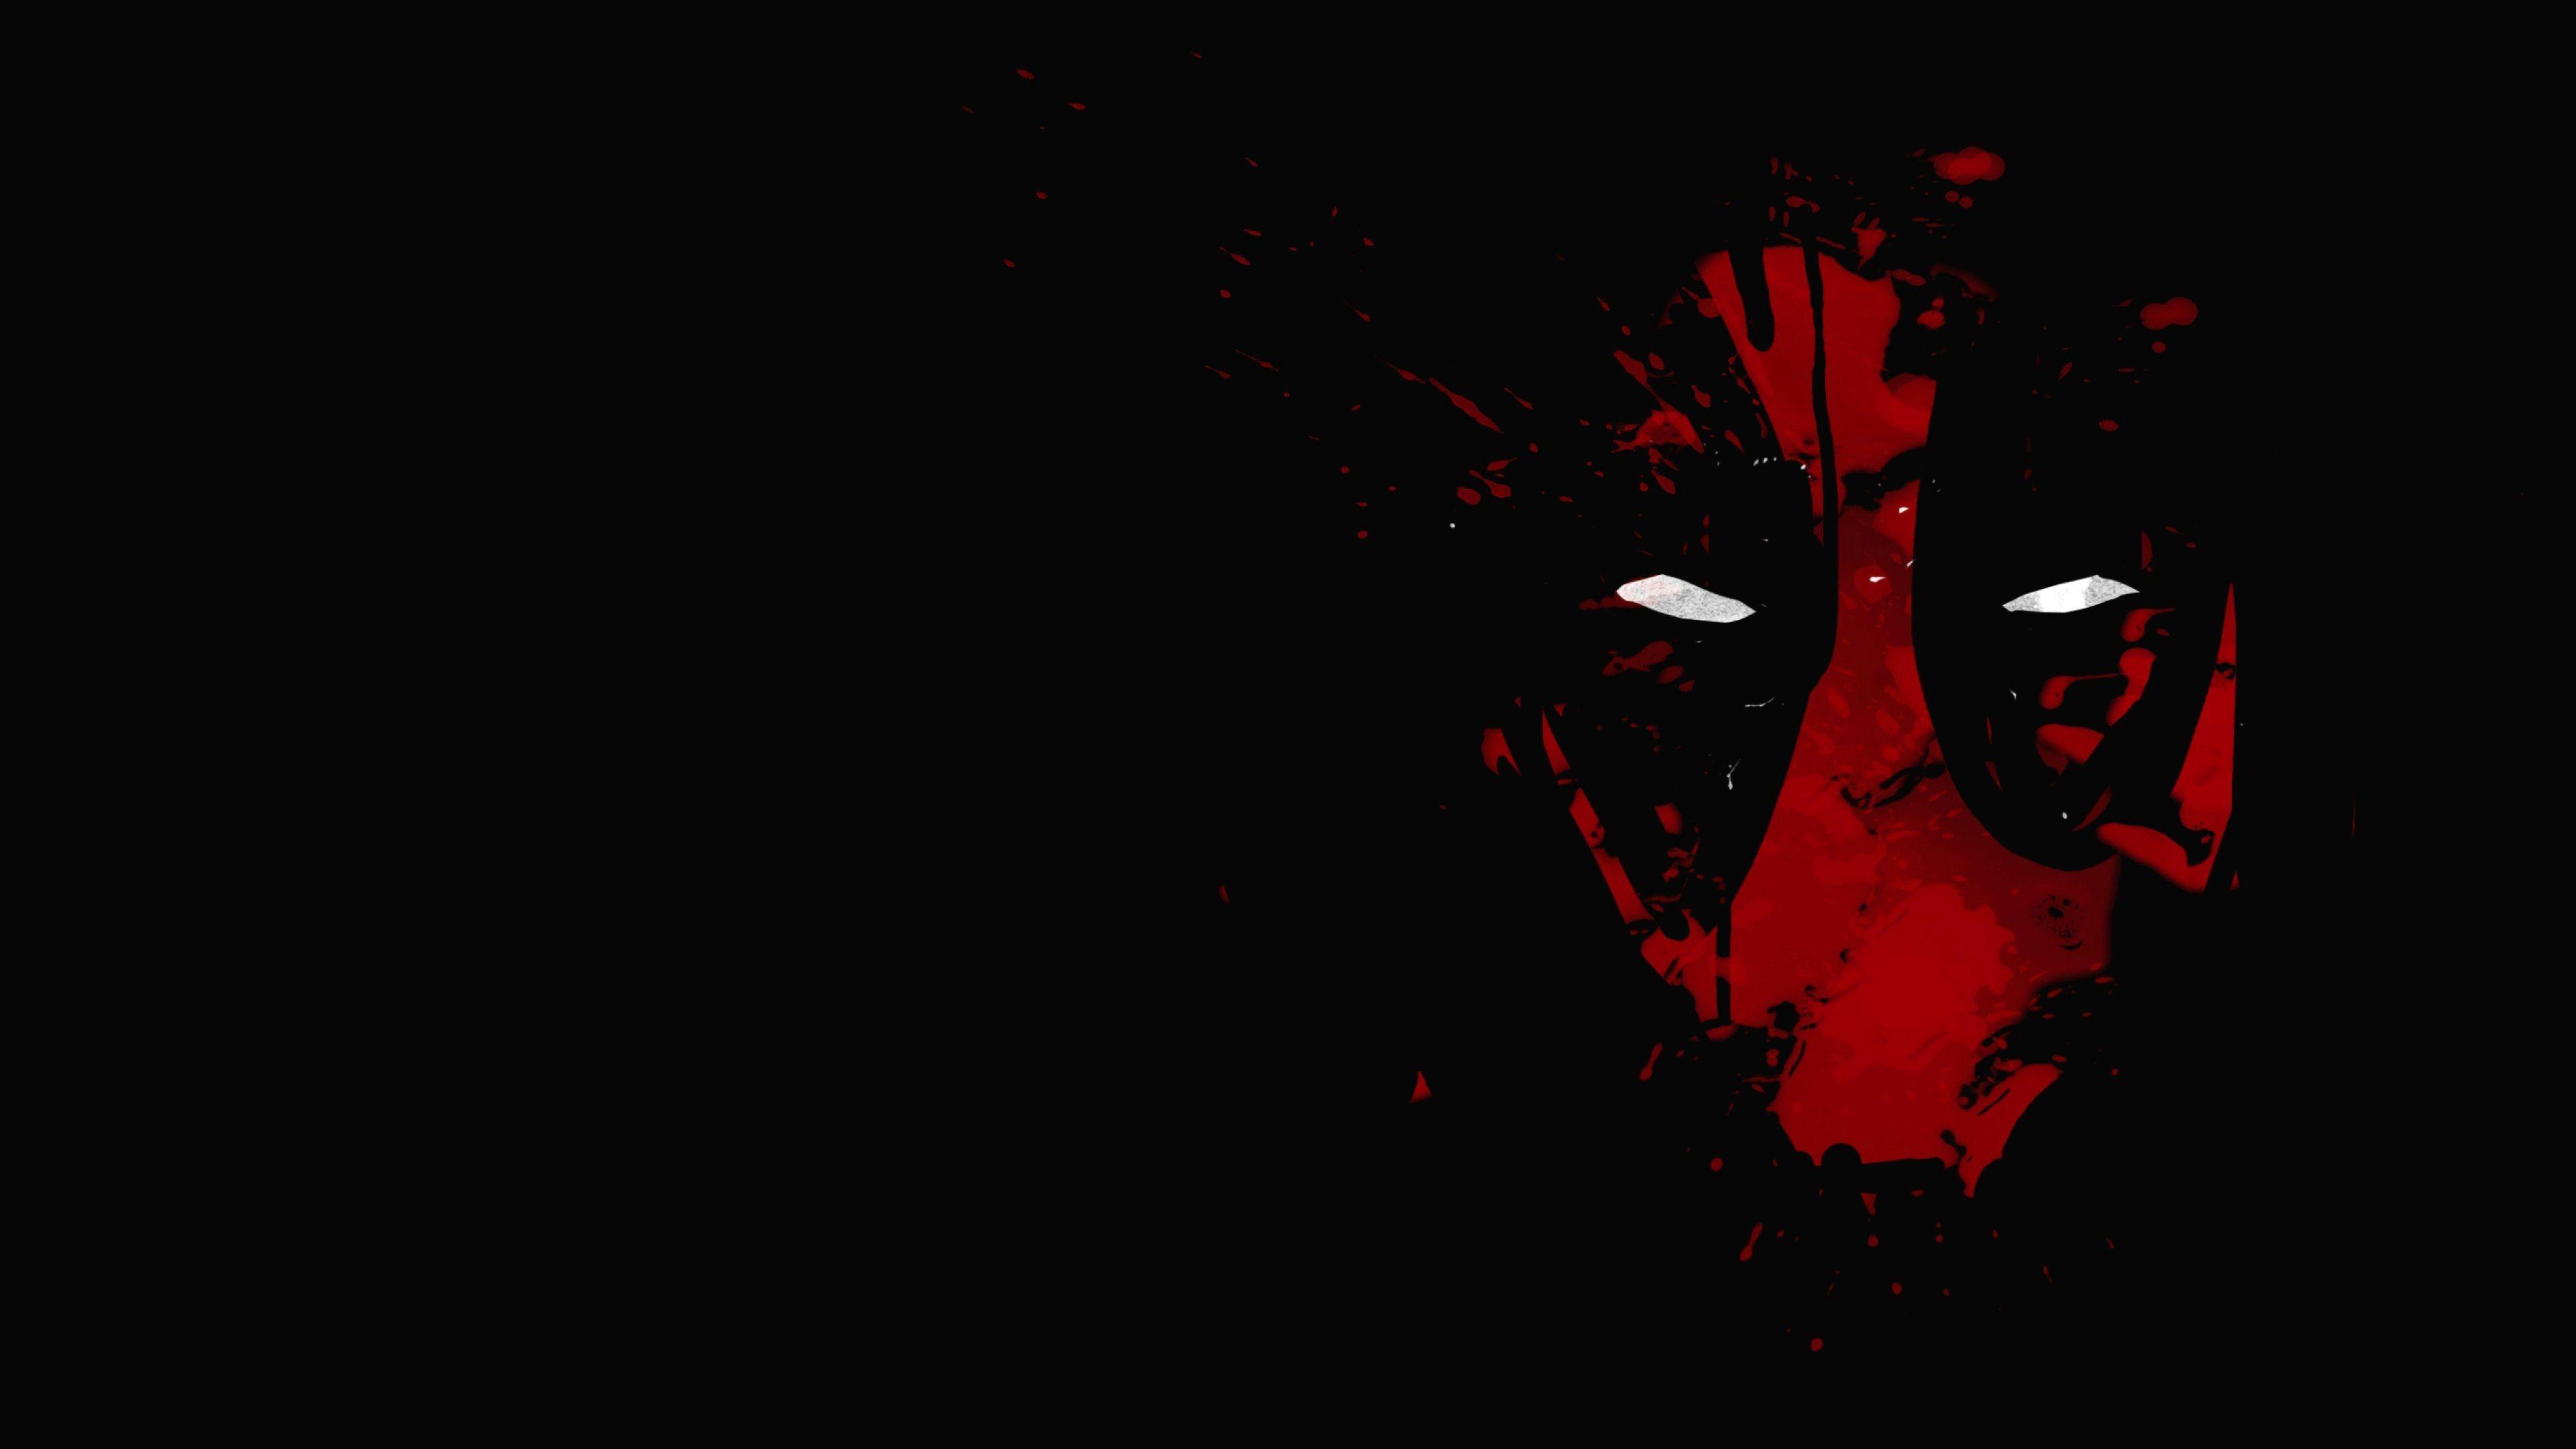 Wallpaper 4k Cool Gallery Deadpool Logo Wallpaper 4k Wallpapers For Pc Deadpool Wallpaper